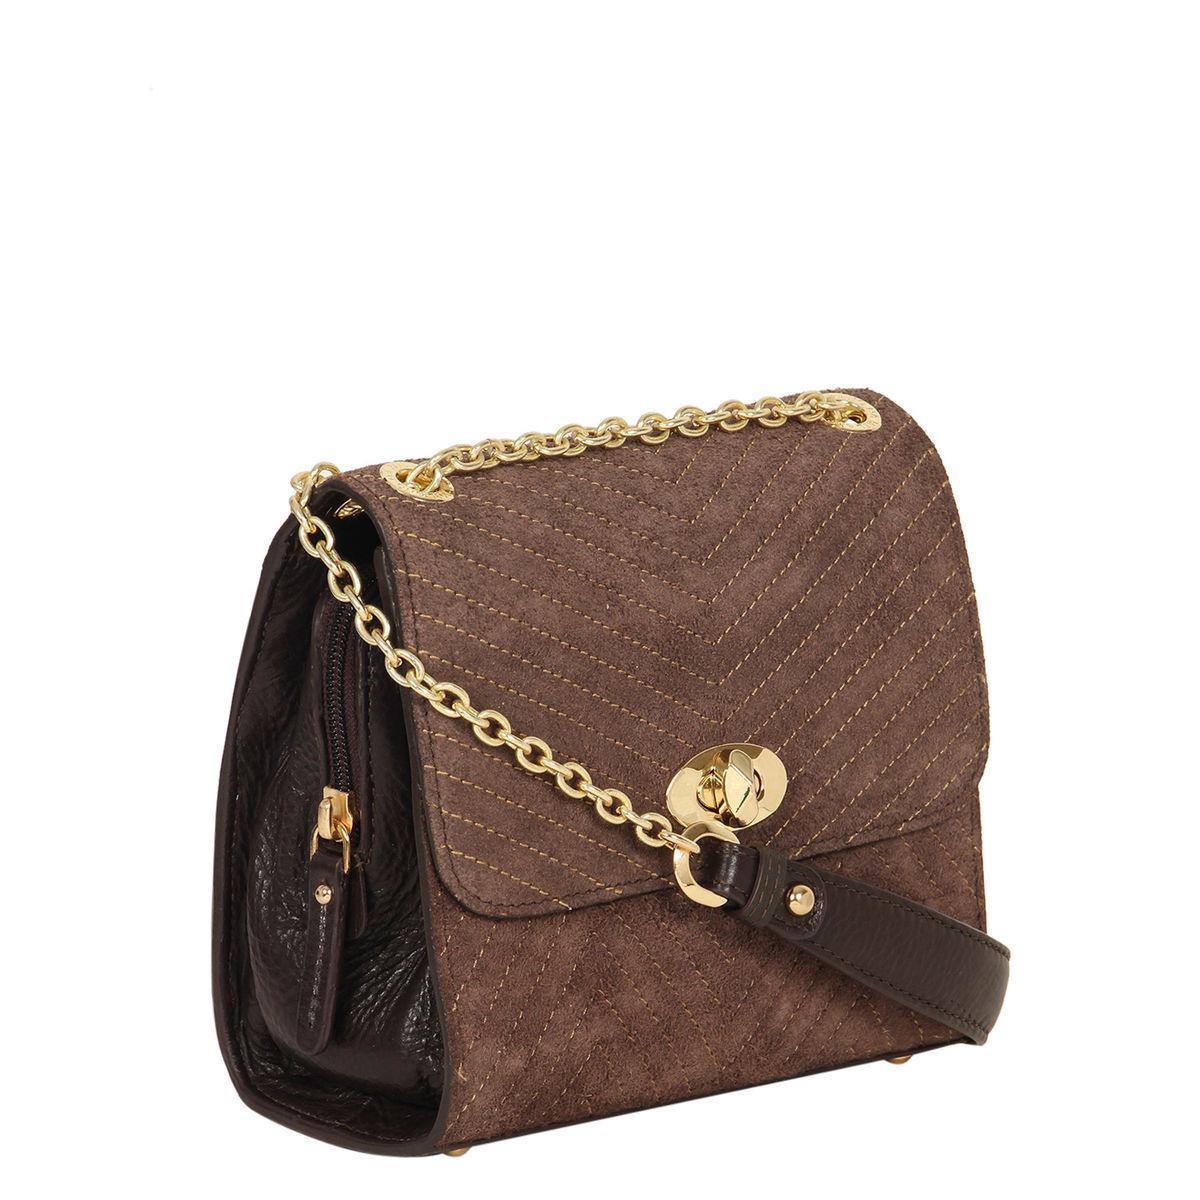 305b42201c1 Da Milano Brown Sling Bag